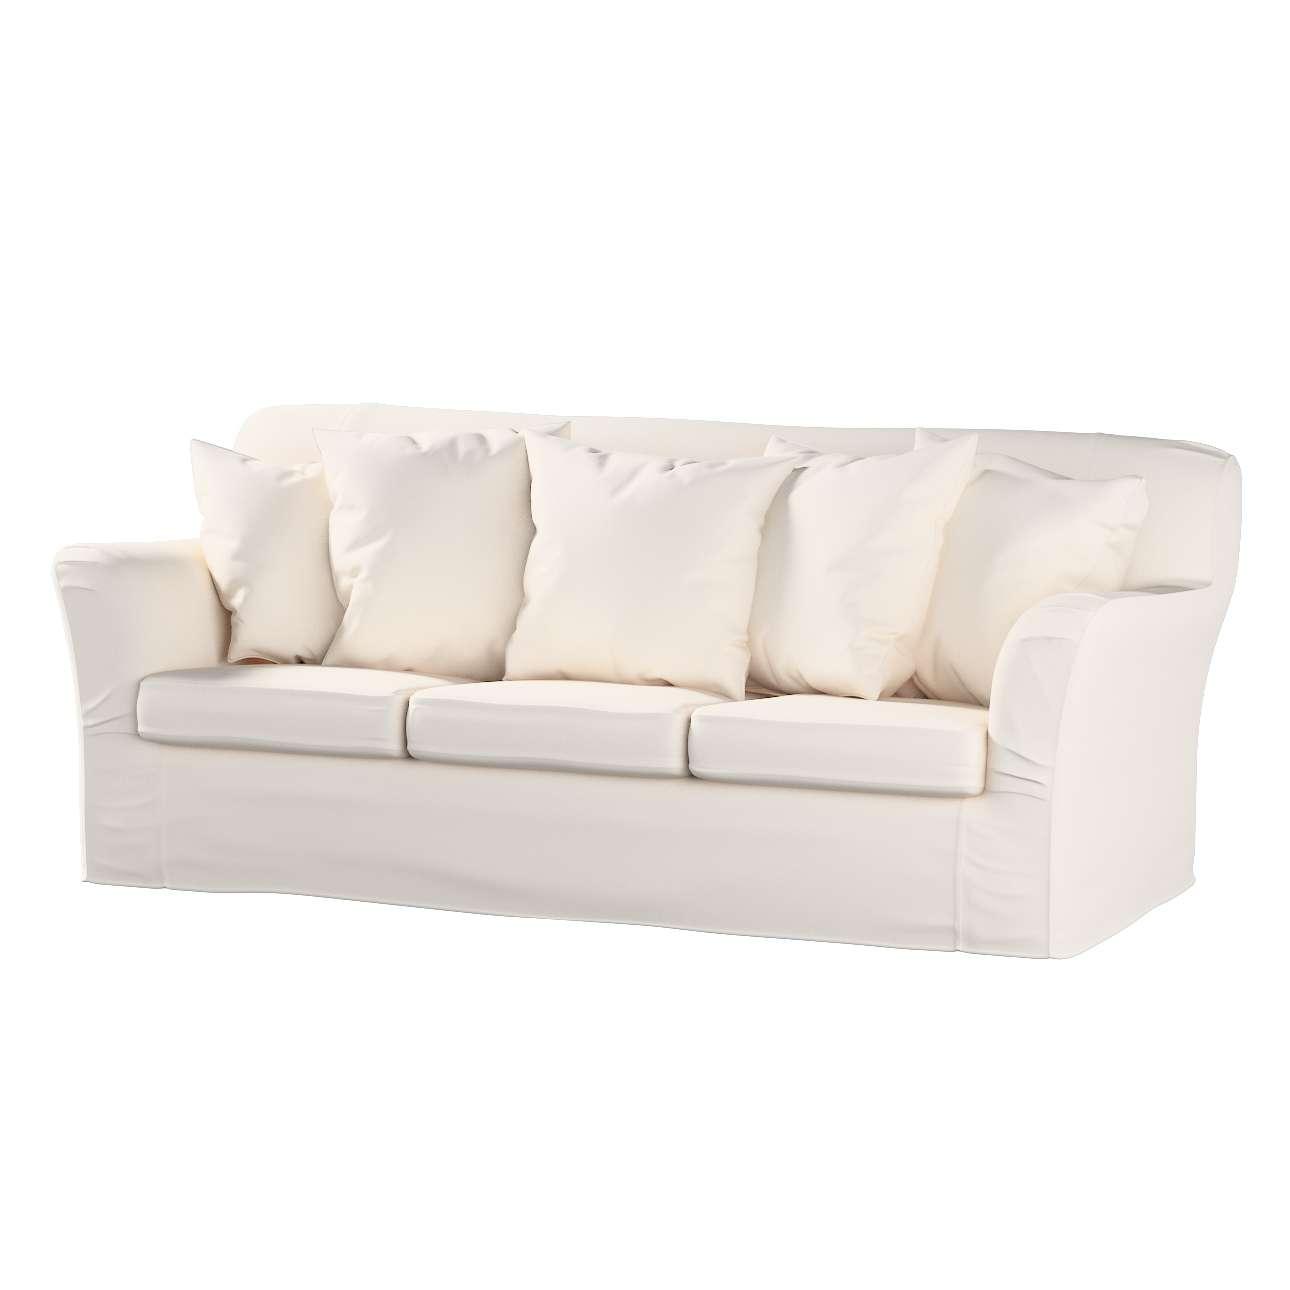 tomelilla bezug f r das sofa im online shop. Black Bedroom Furniture Sets. Home Design Ideas